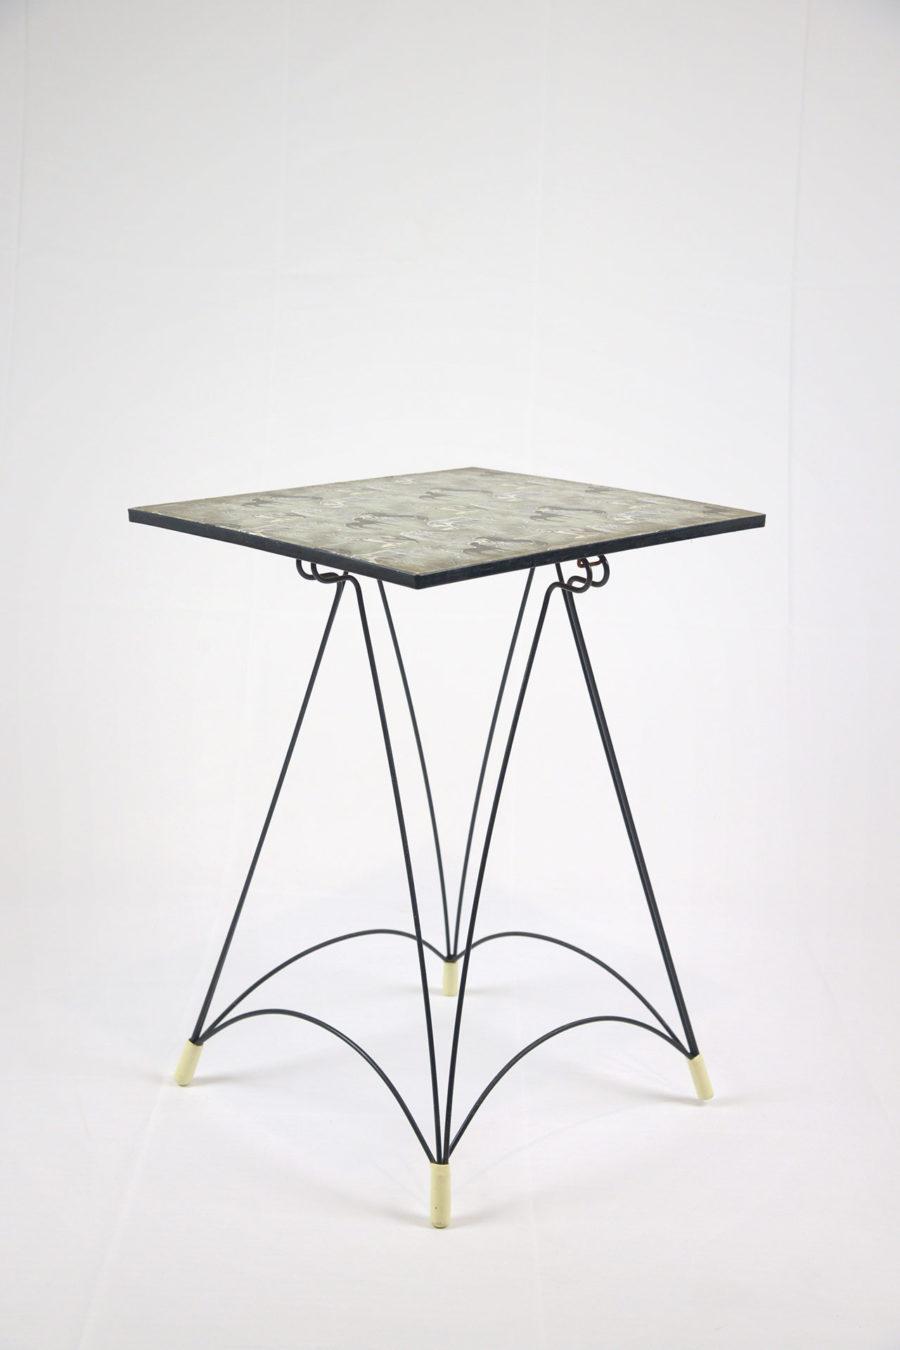 Petite table - DSC_9255.jpg